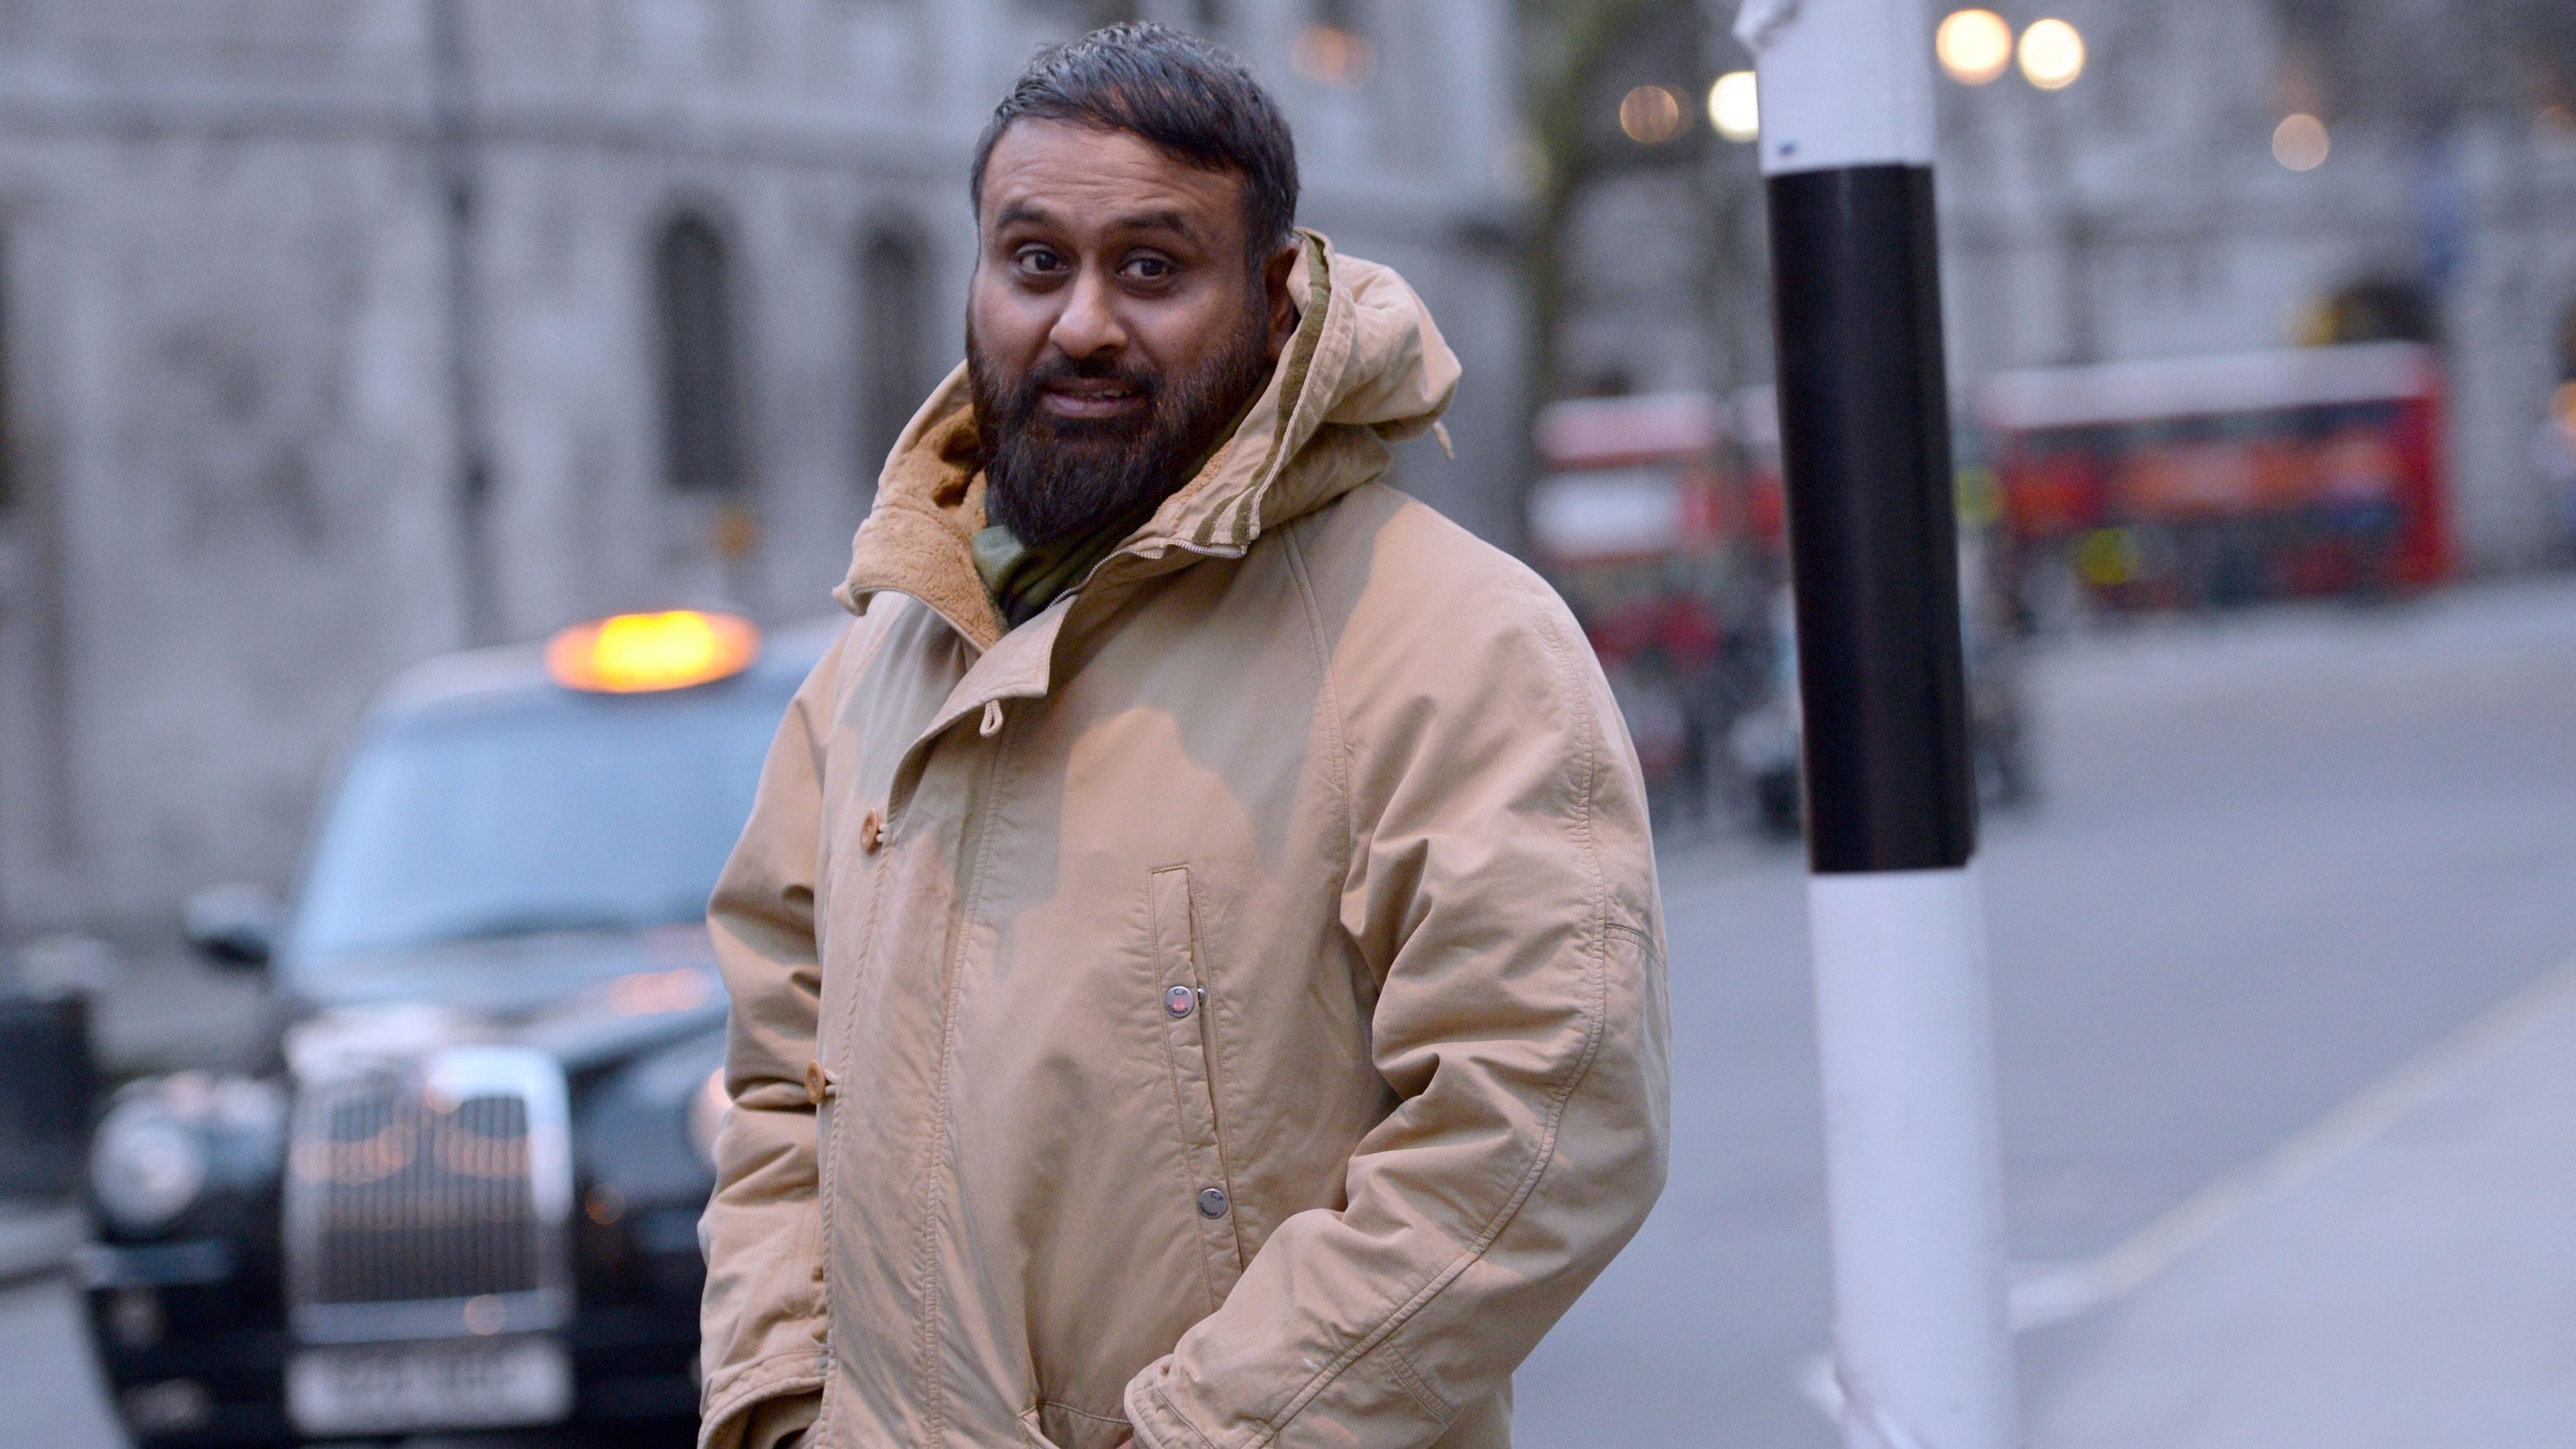 Estranged pair await court ruling on whether Islamic